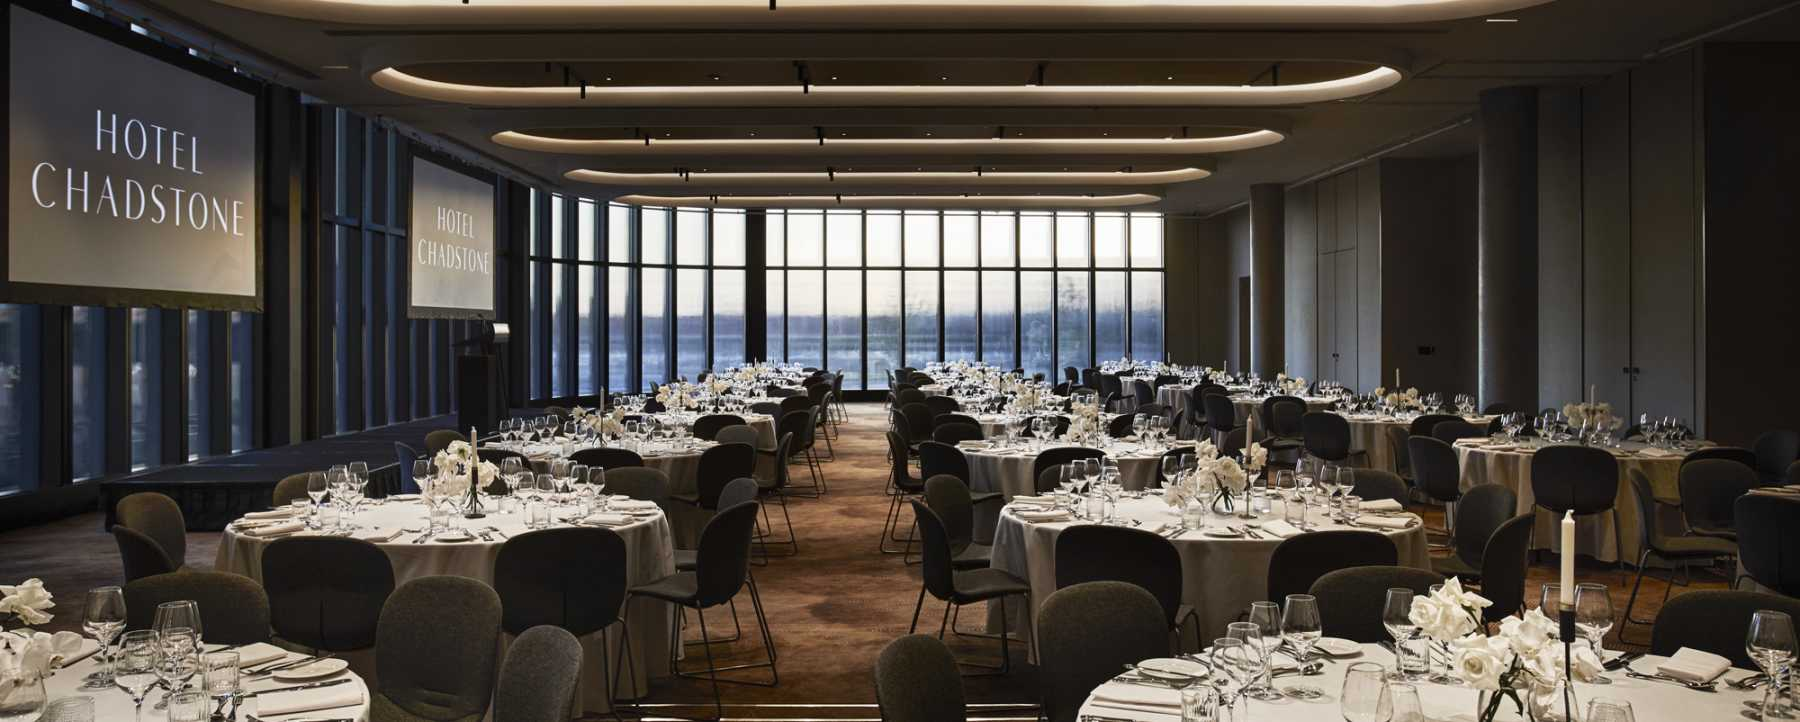 Hotel Chadstone Melbourne - Ballroom